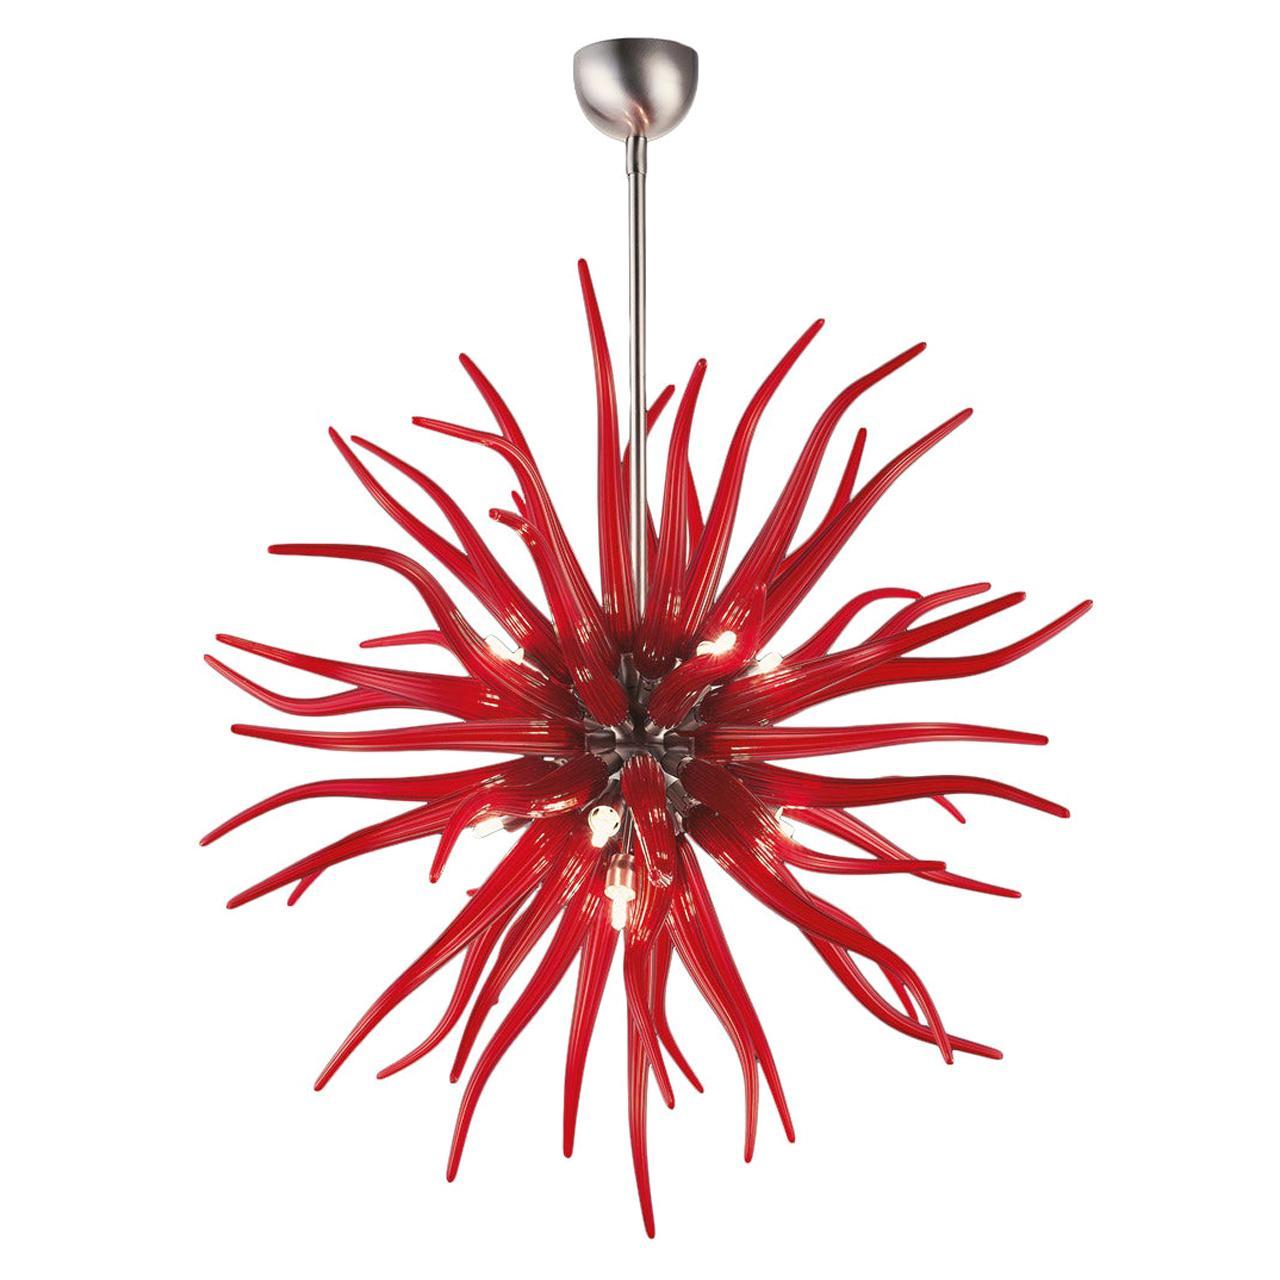 Artistic Blown Handmade Murano Glass Chandelier Medusa by La Murrina